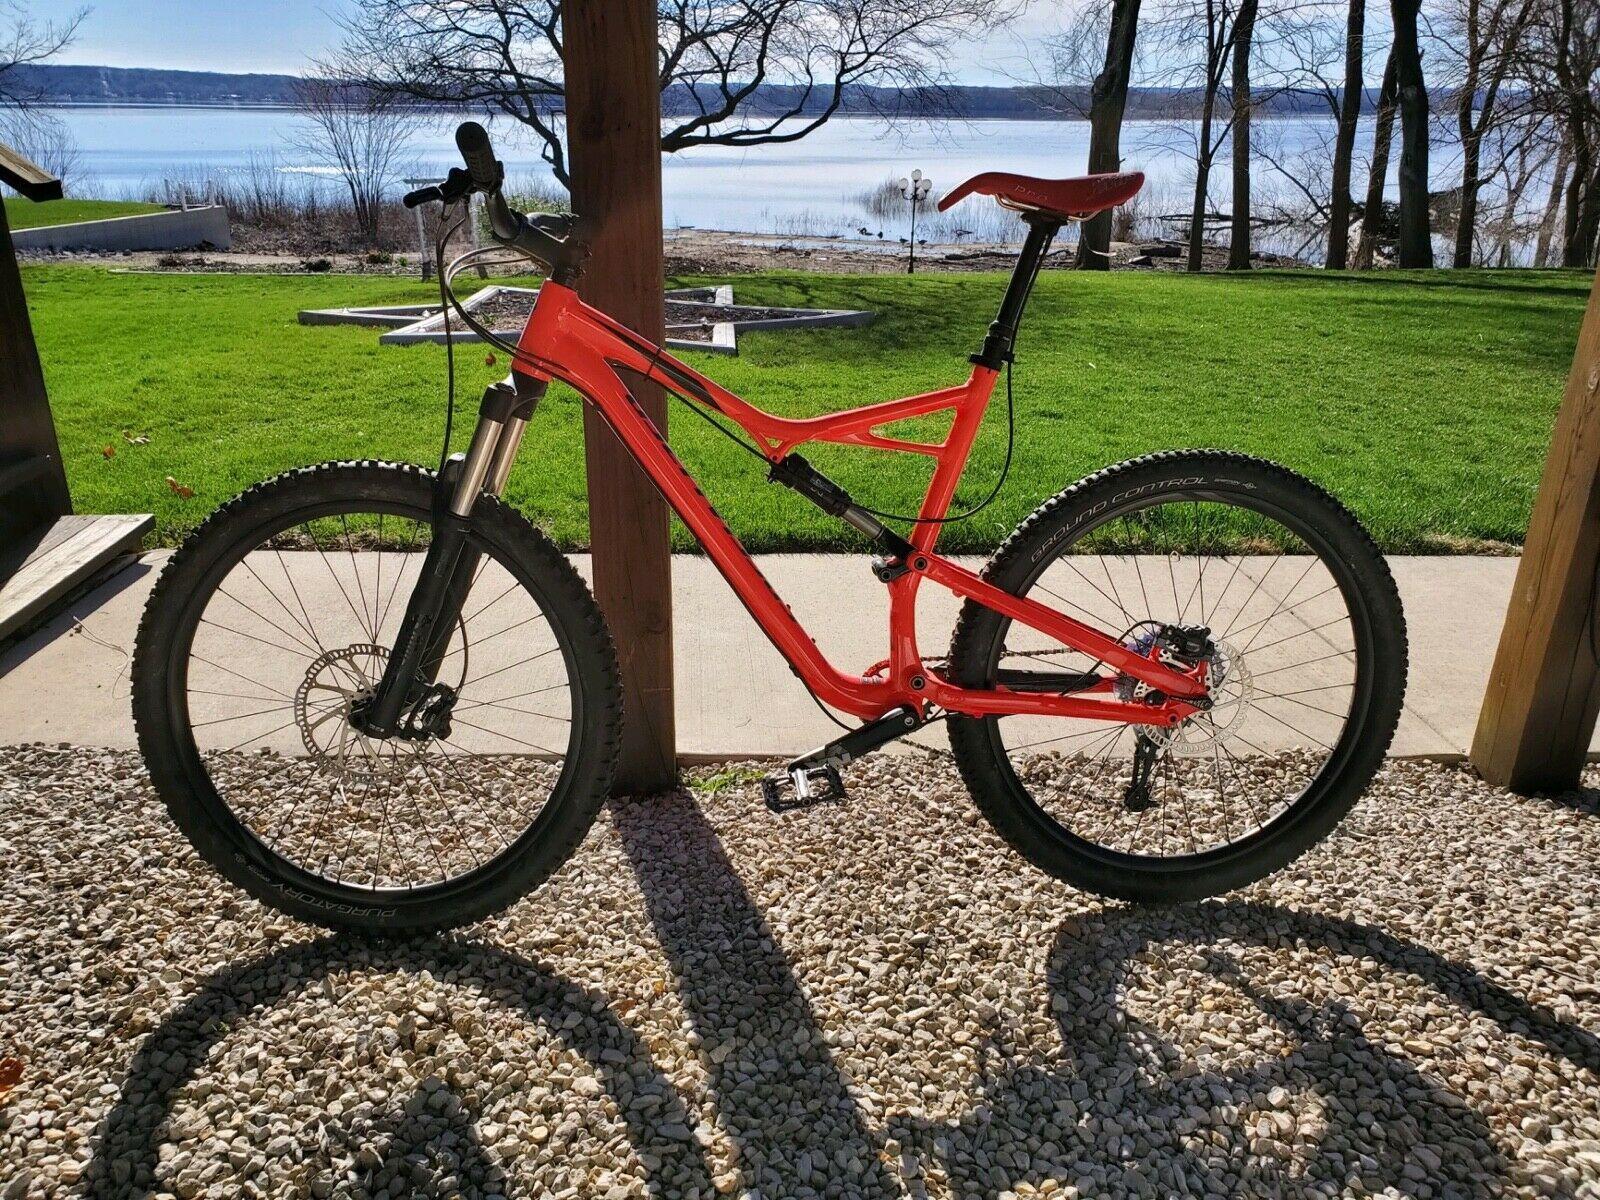 2017 Specialized Xl Mountain Bike 29ercamber Fsr Mountain Bike